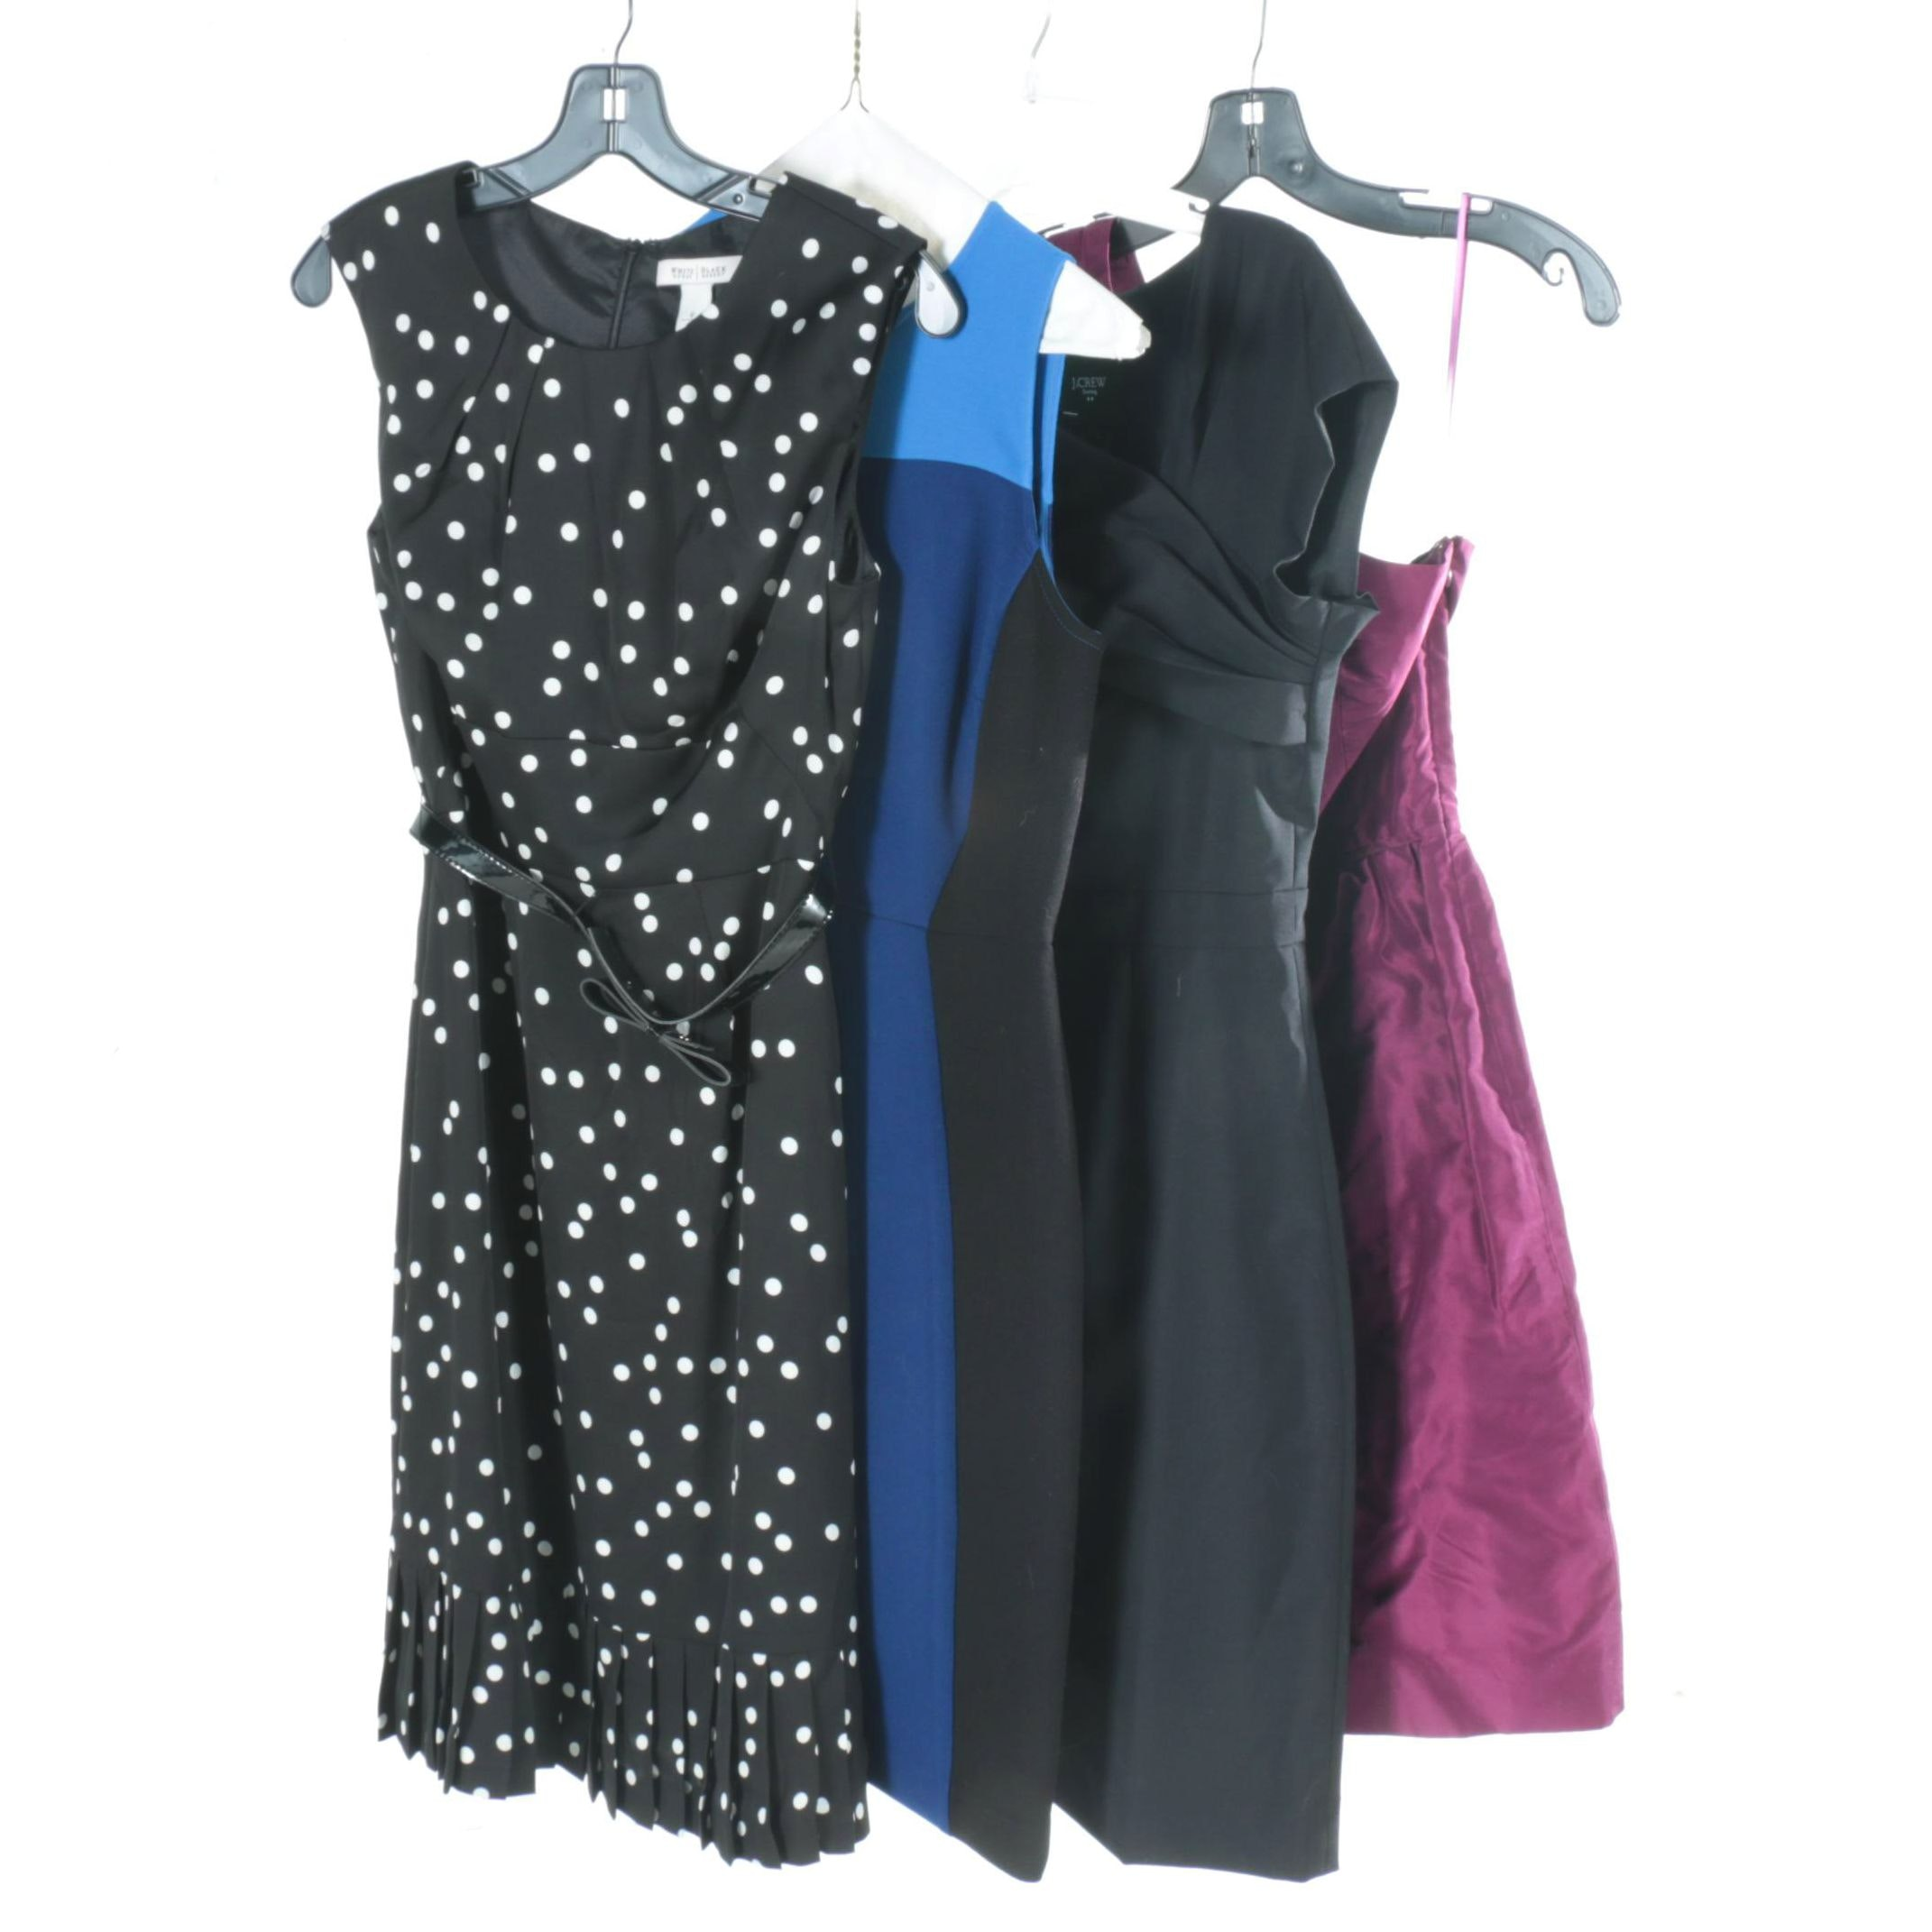 Women's Dresses Including J.Crew, White House Black Market, and Ann Taylor LOFT